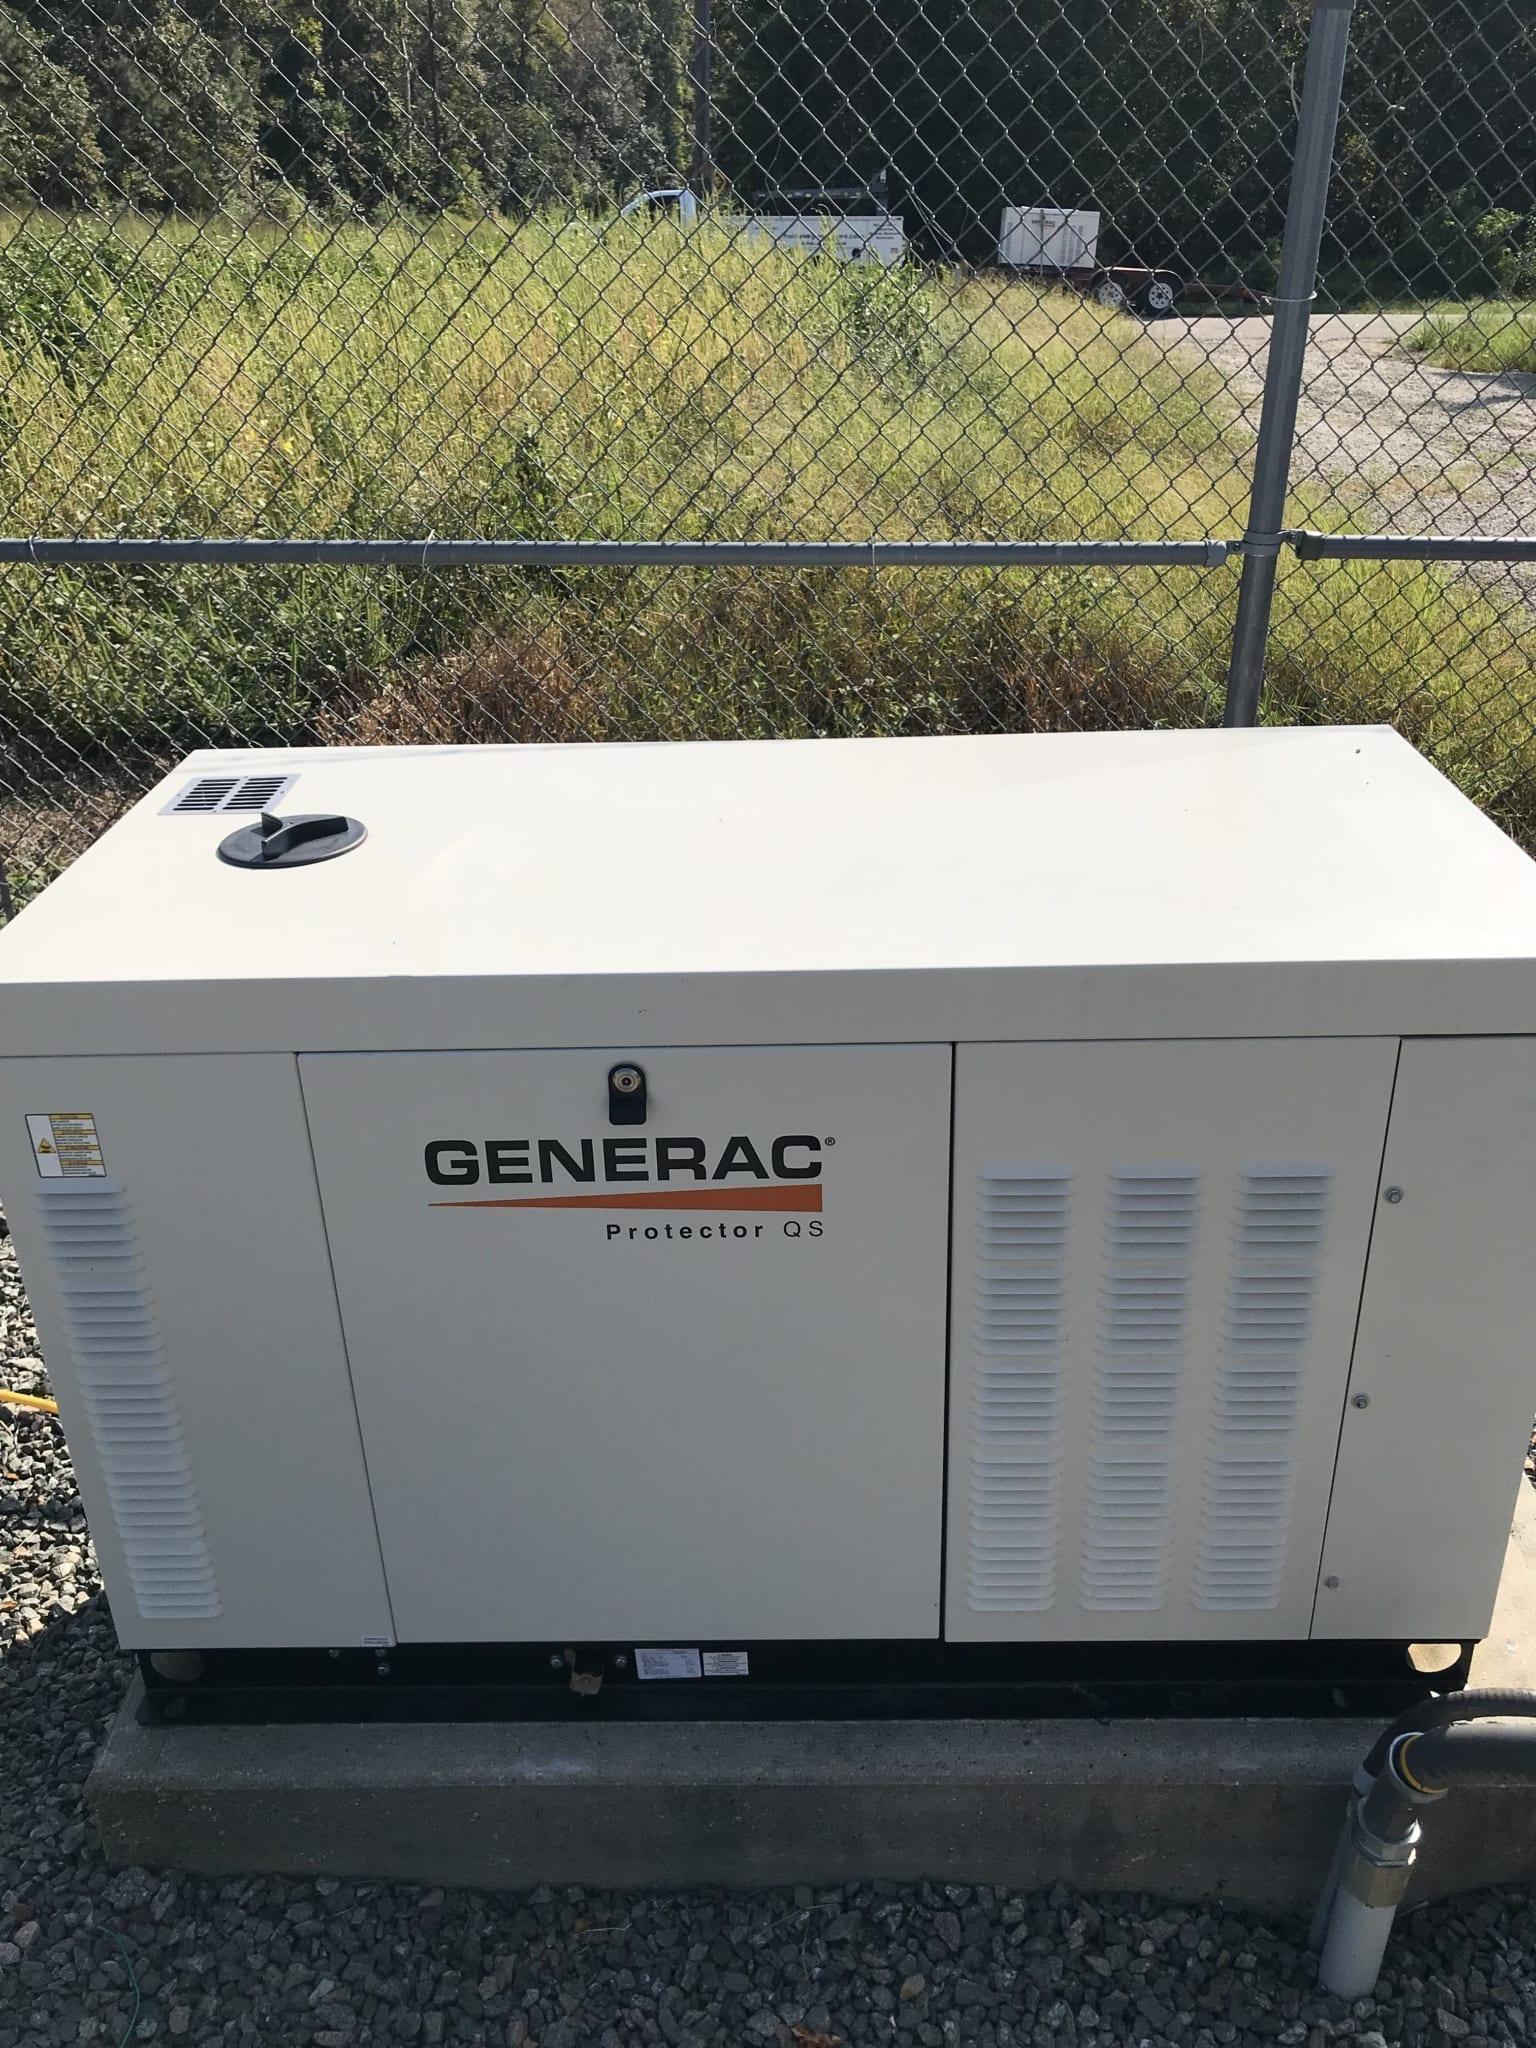 9.24.19 Sussex Generac Automatic Standby Generator